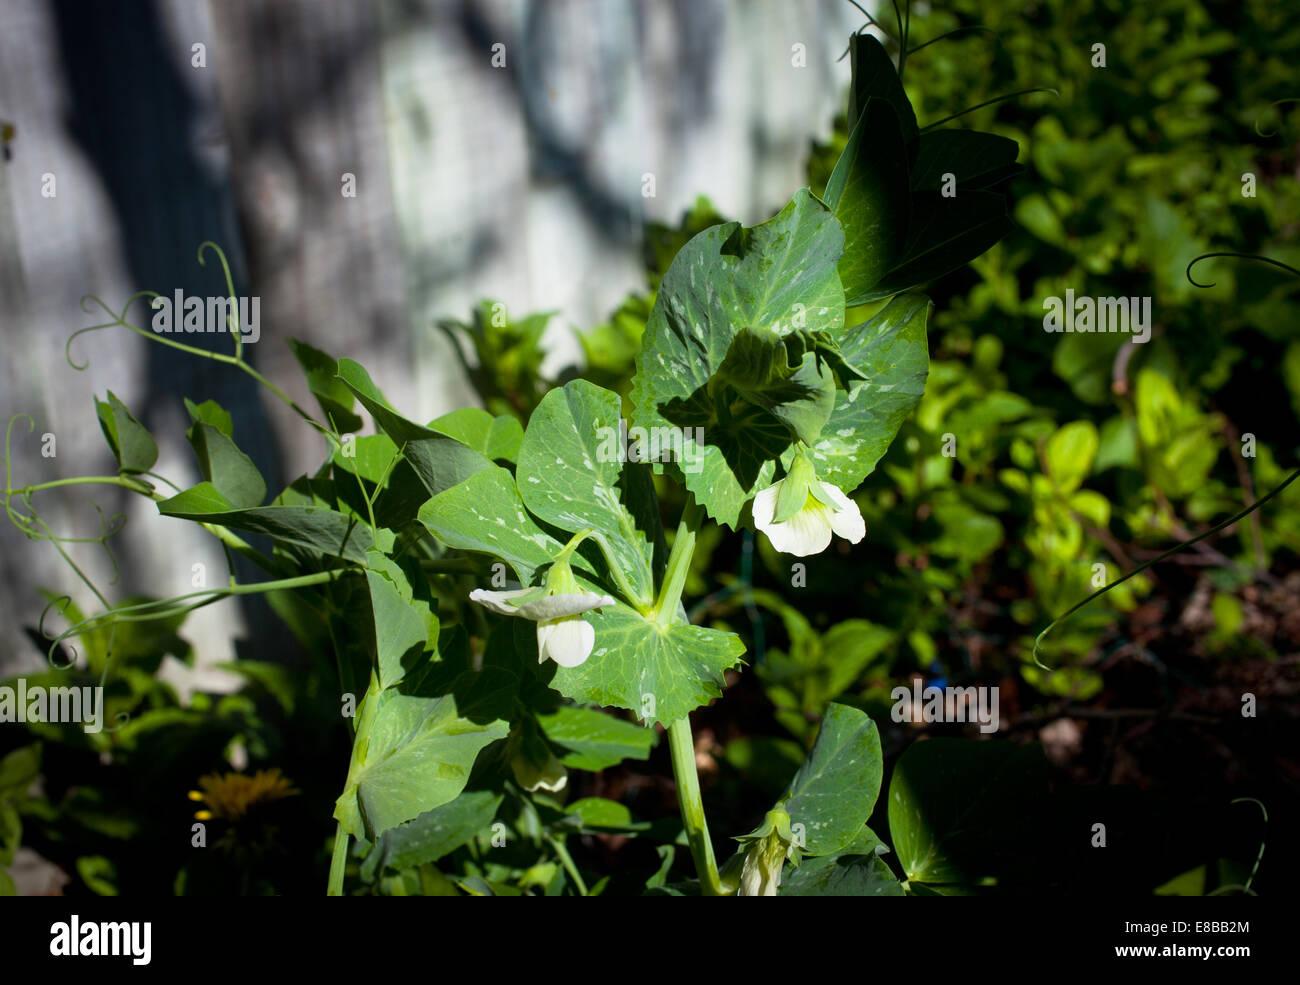 Pea flowers - Stock Image